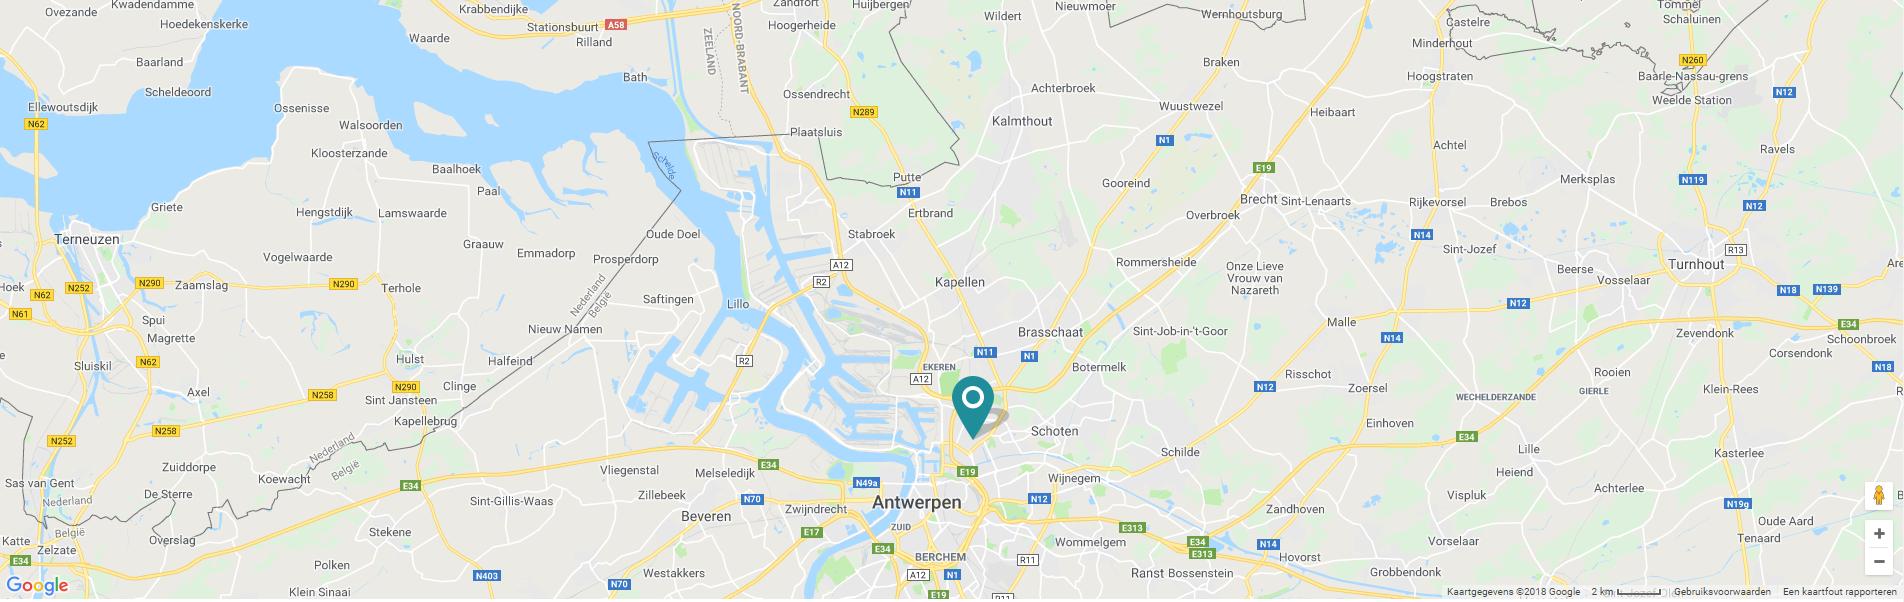 Data Attribute Gmap | Drupal org